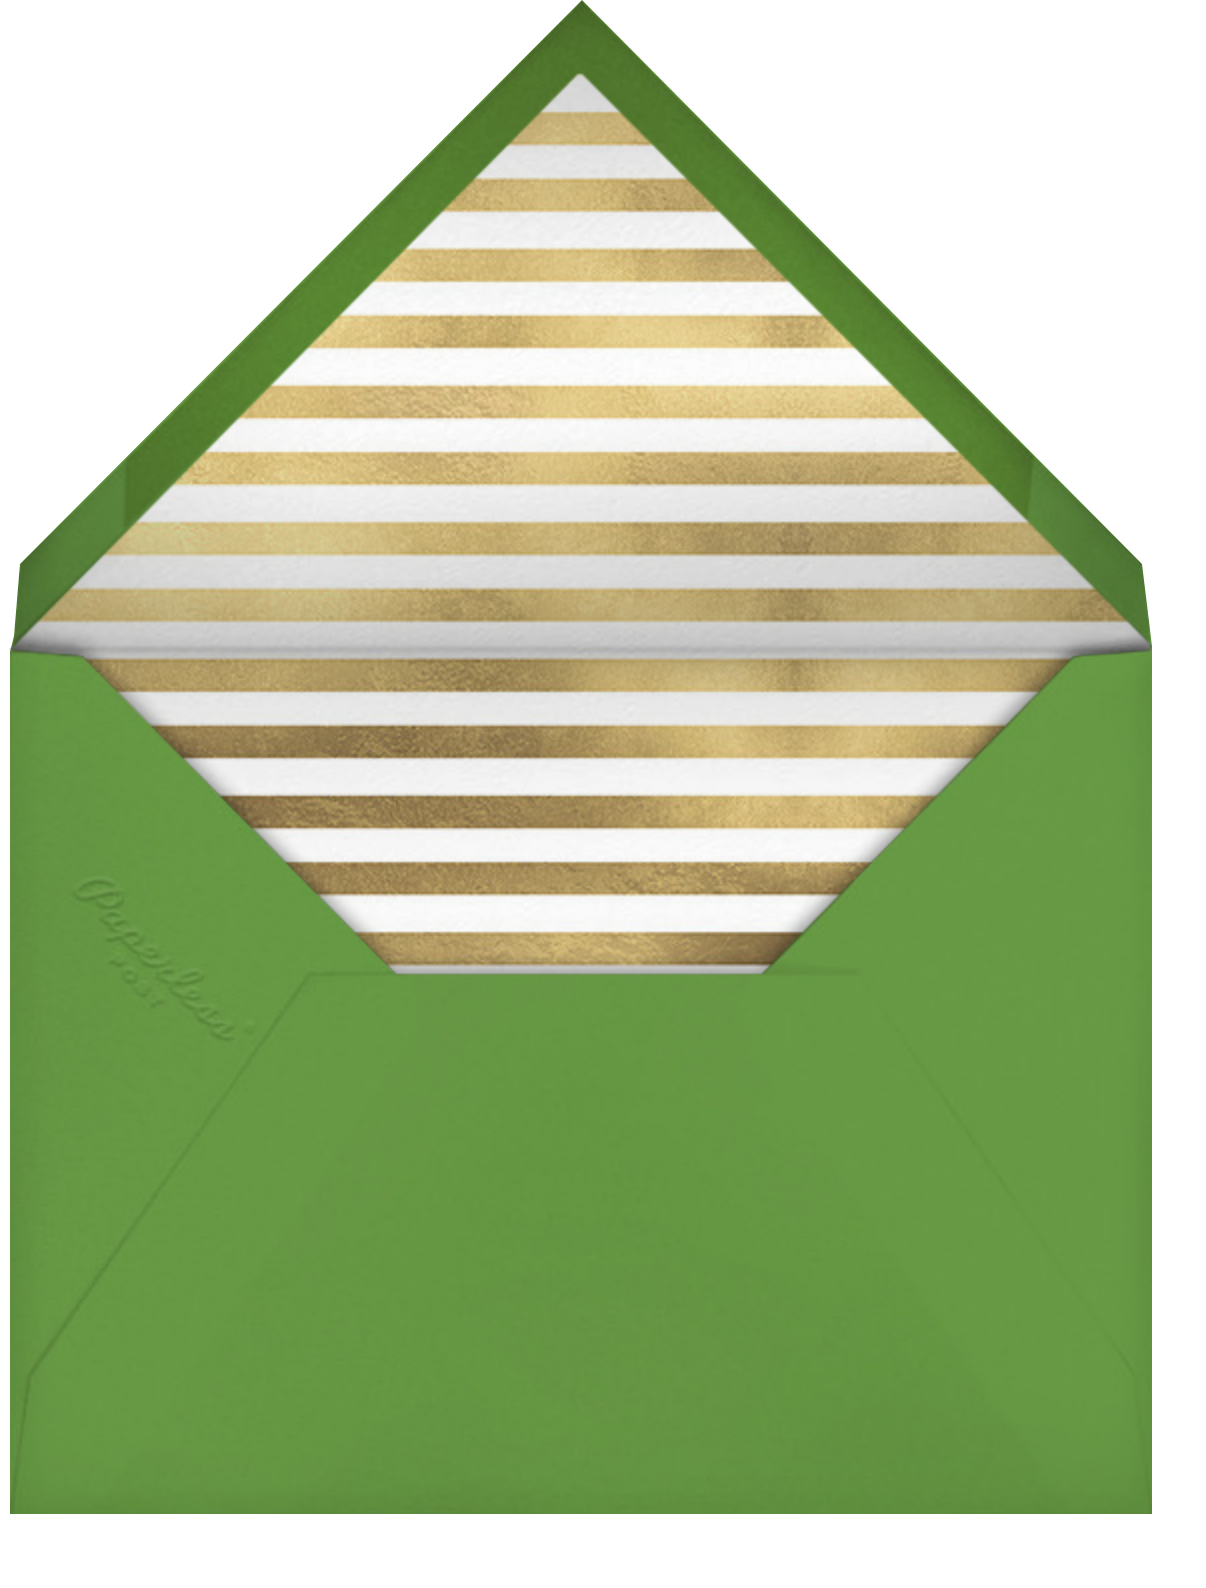 Tassel - Gold - kate spade new york - Graduation - envelope back